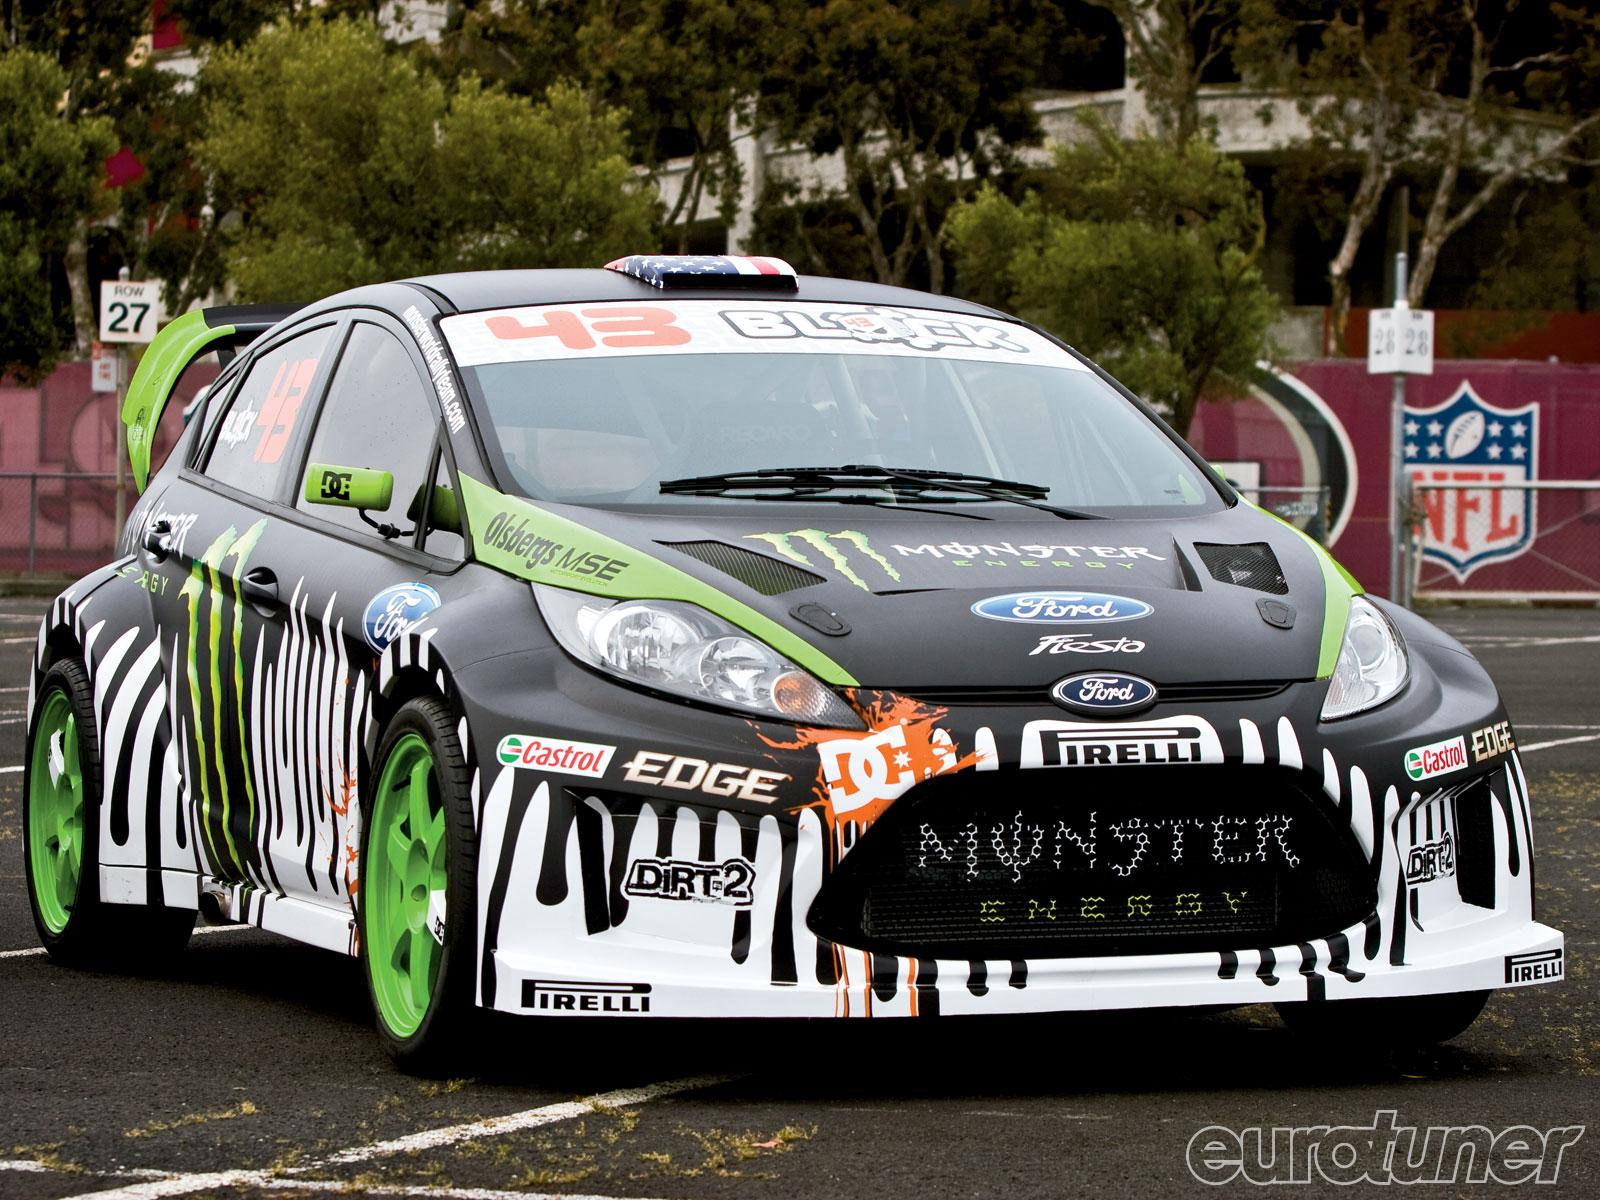 2011 Ford Fiesta Ken Block Eurotuner Magazine